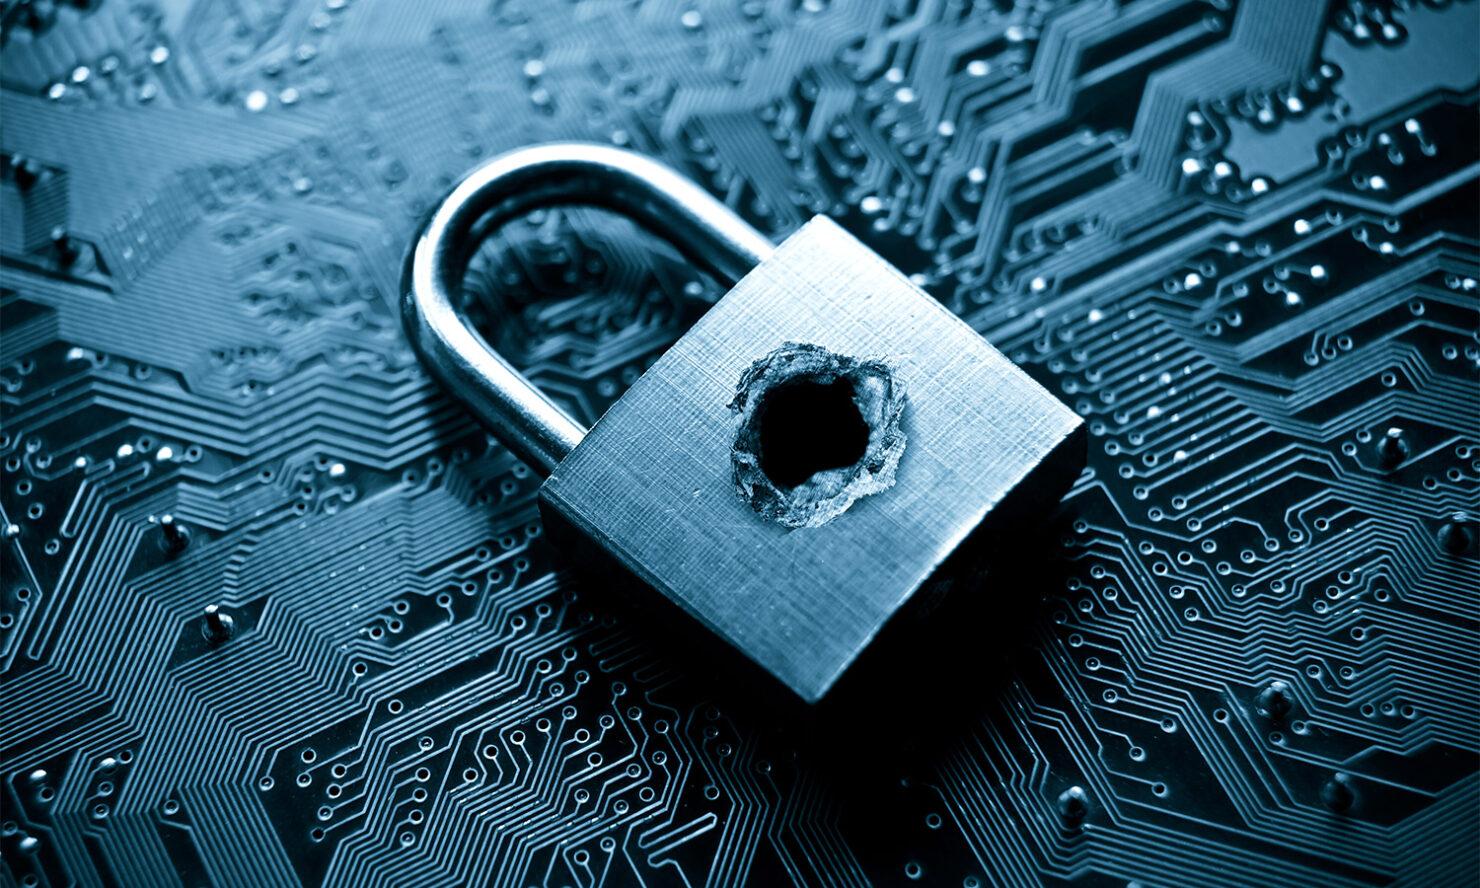 windows xp apps microsoft security breach